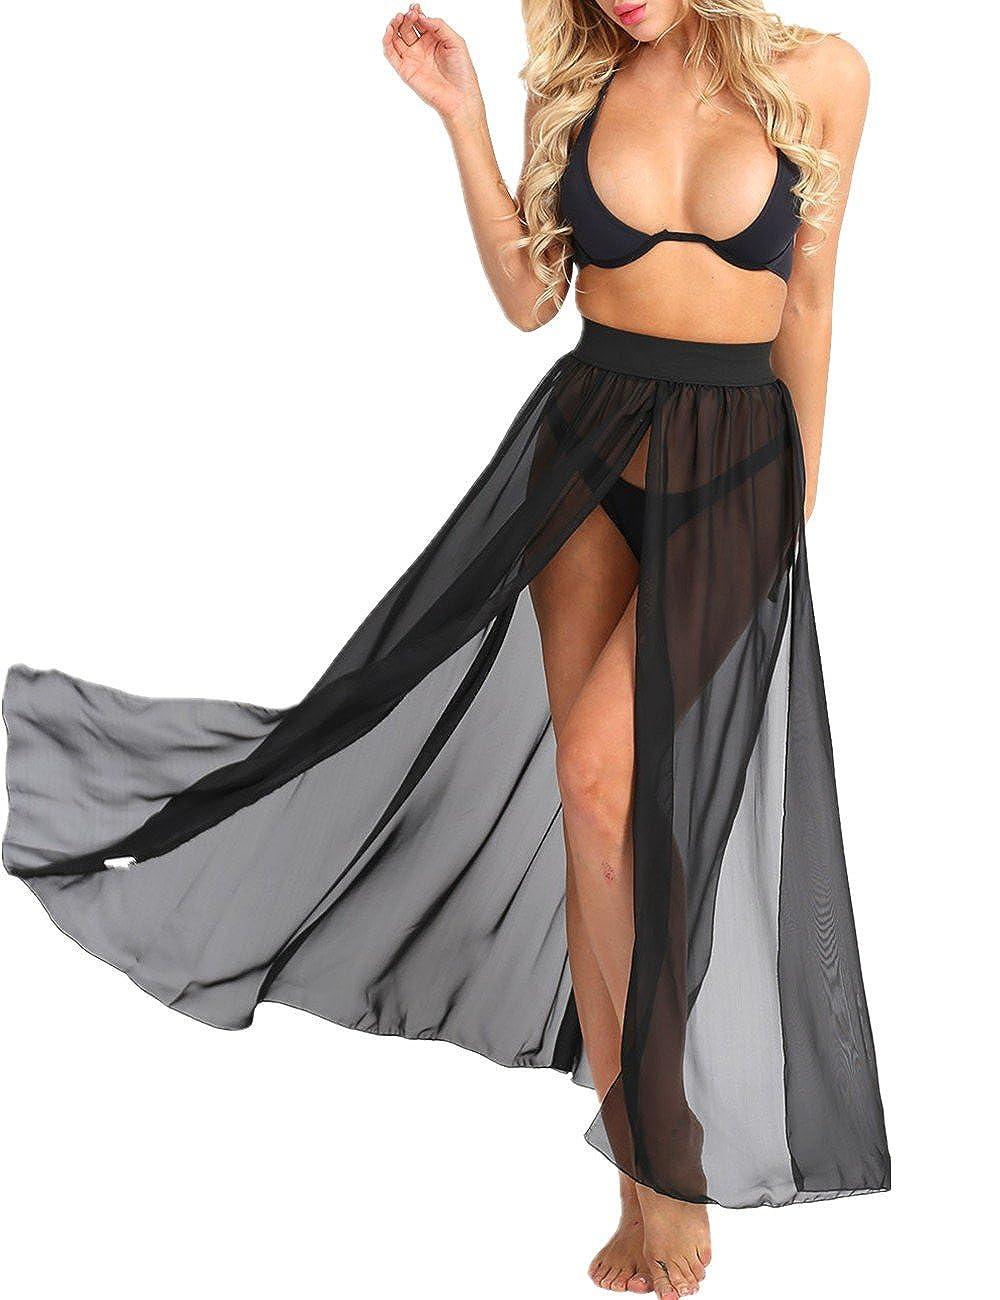 6a62b20df0 Side Split Chiffon Maxi Skirt – DACC